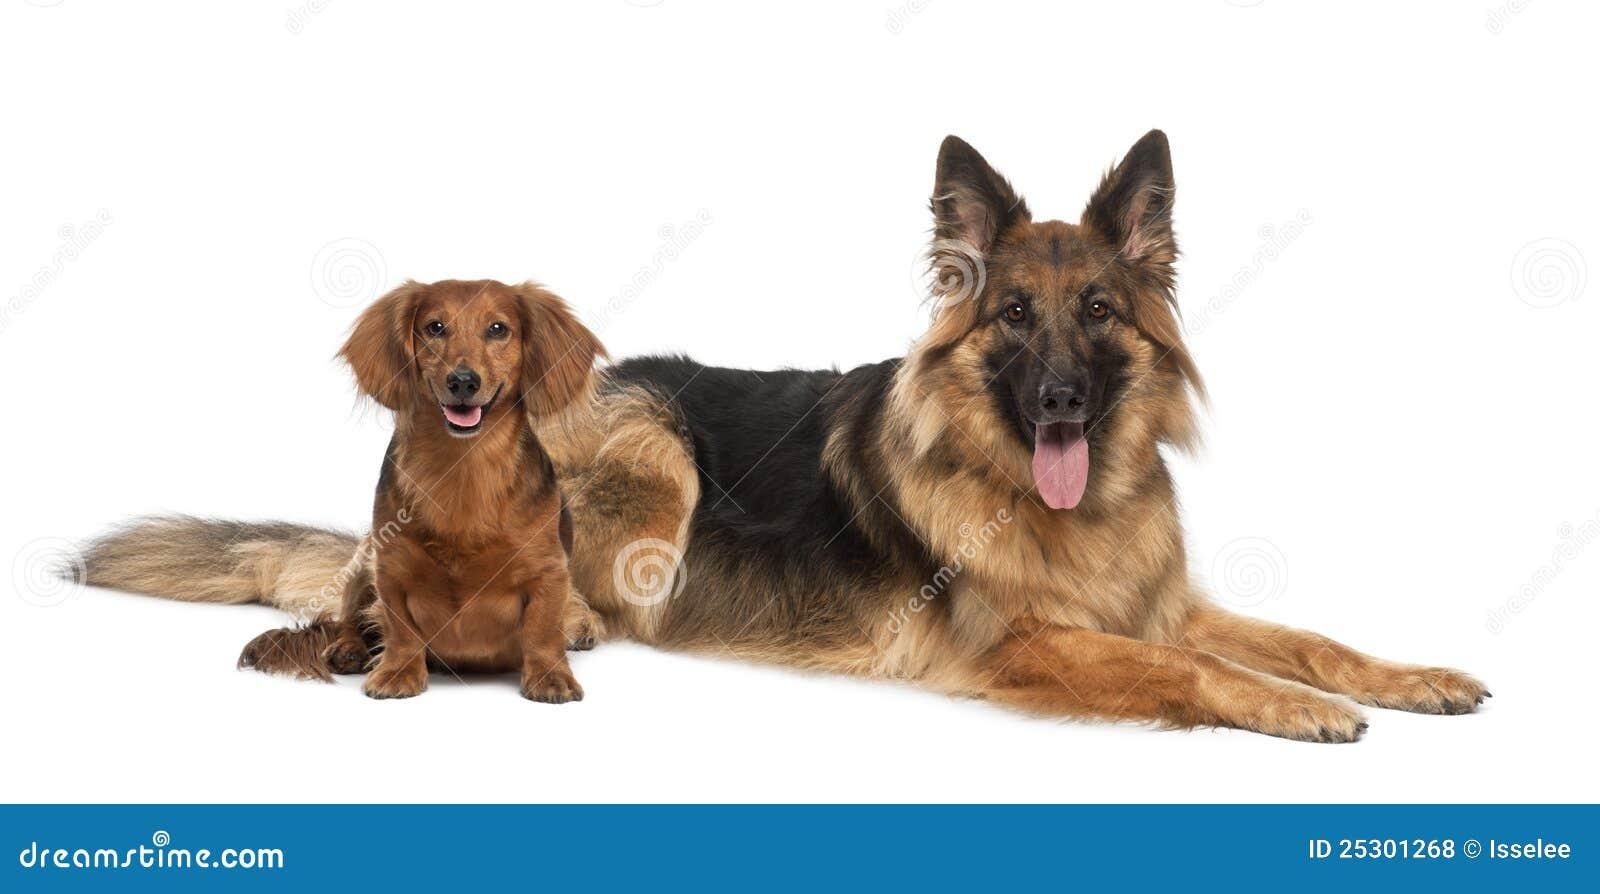 Dachshund, 9 Years Old, German Shepherd Dog Stock Photo ...